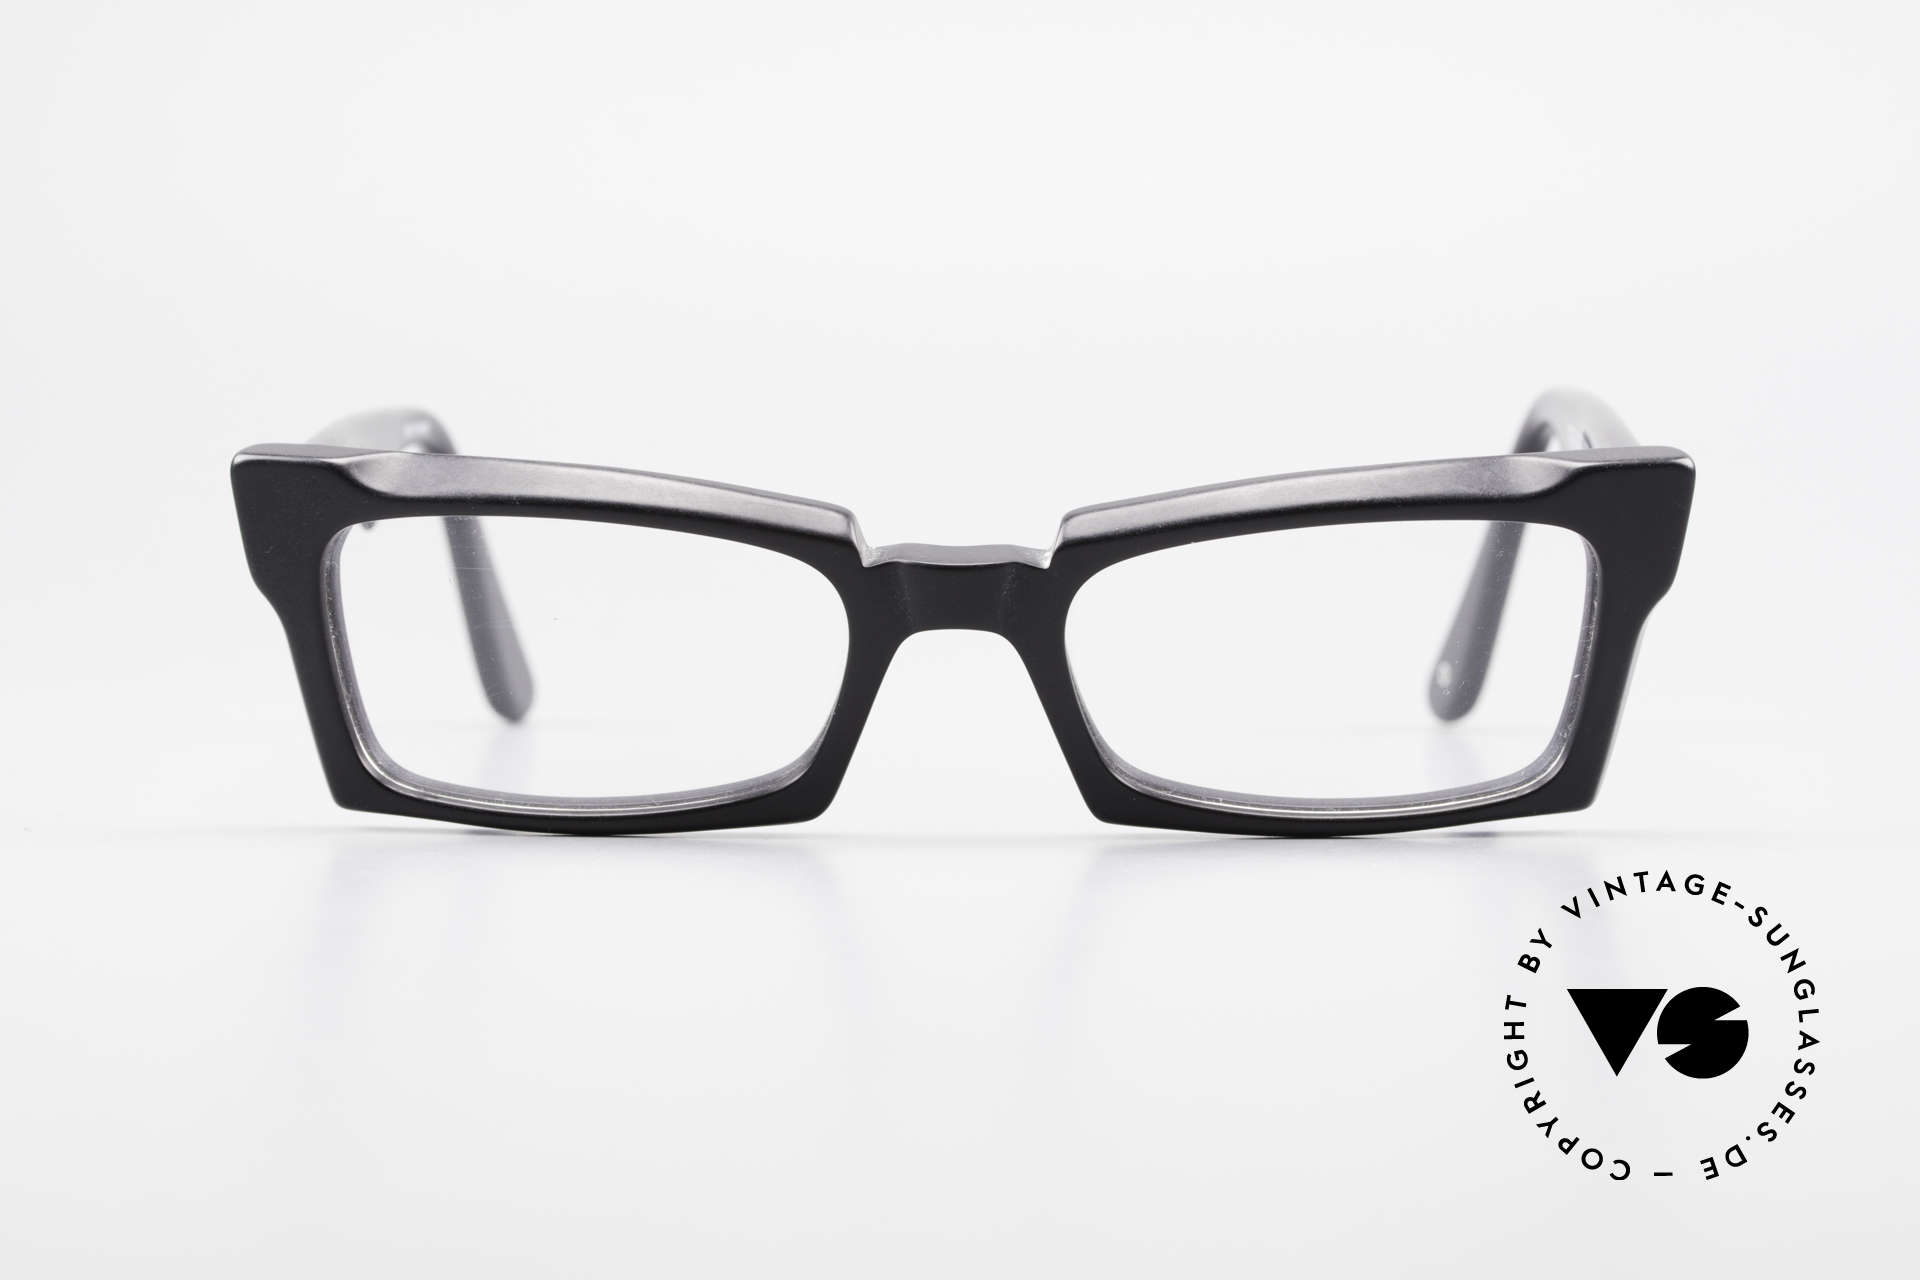 Anne Et Valentin Belphegor Old 80's Glasses True Vintage, the couple Anne (artist) and Valentin (optician), Made for Women